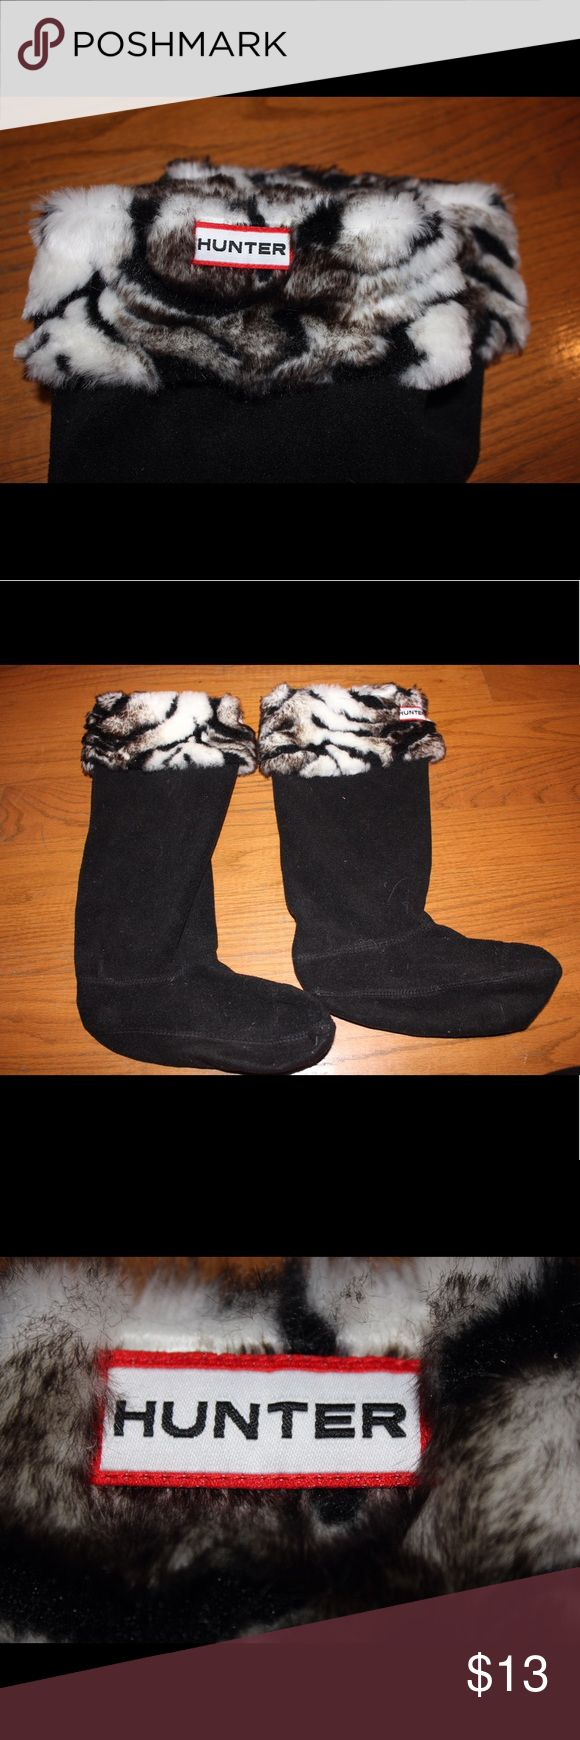 Hunter socks Hunter zebra socks Hunter Boots Accessories Hosiery & Socks